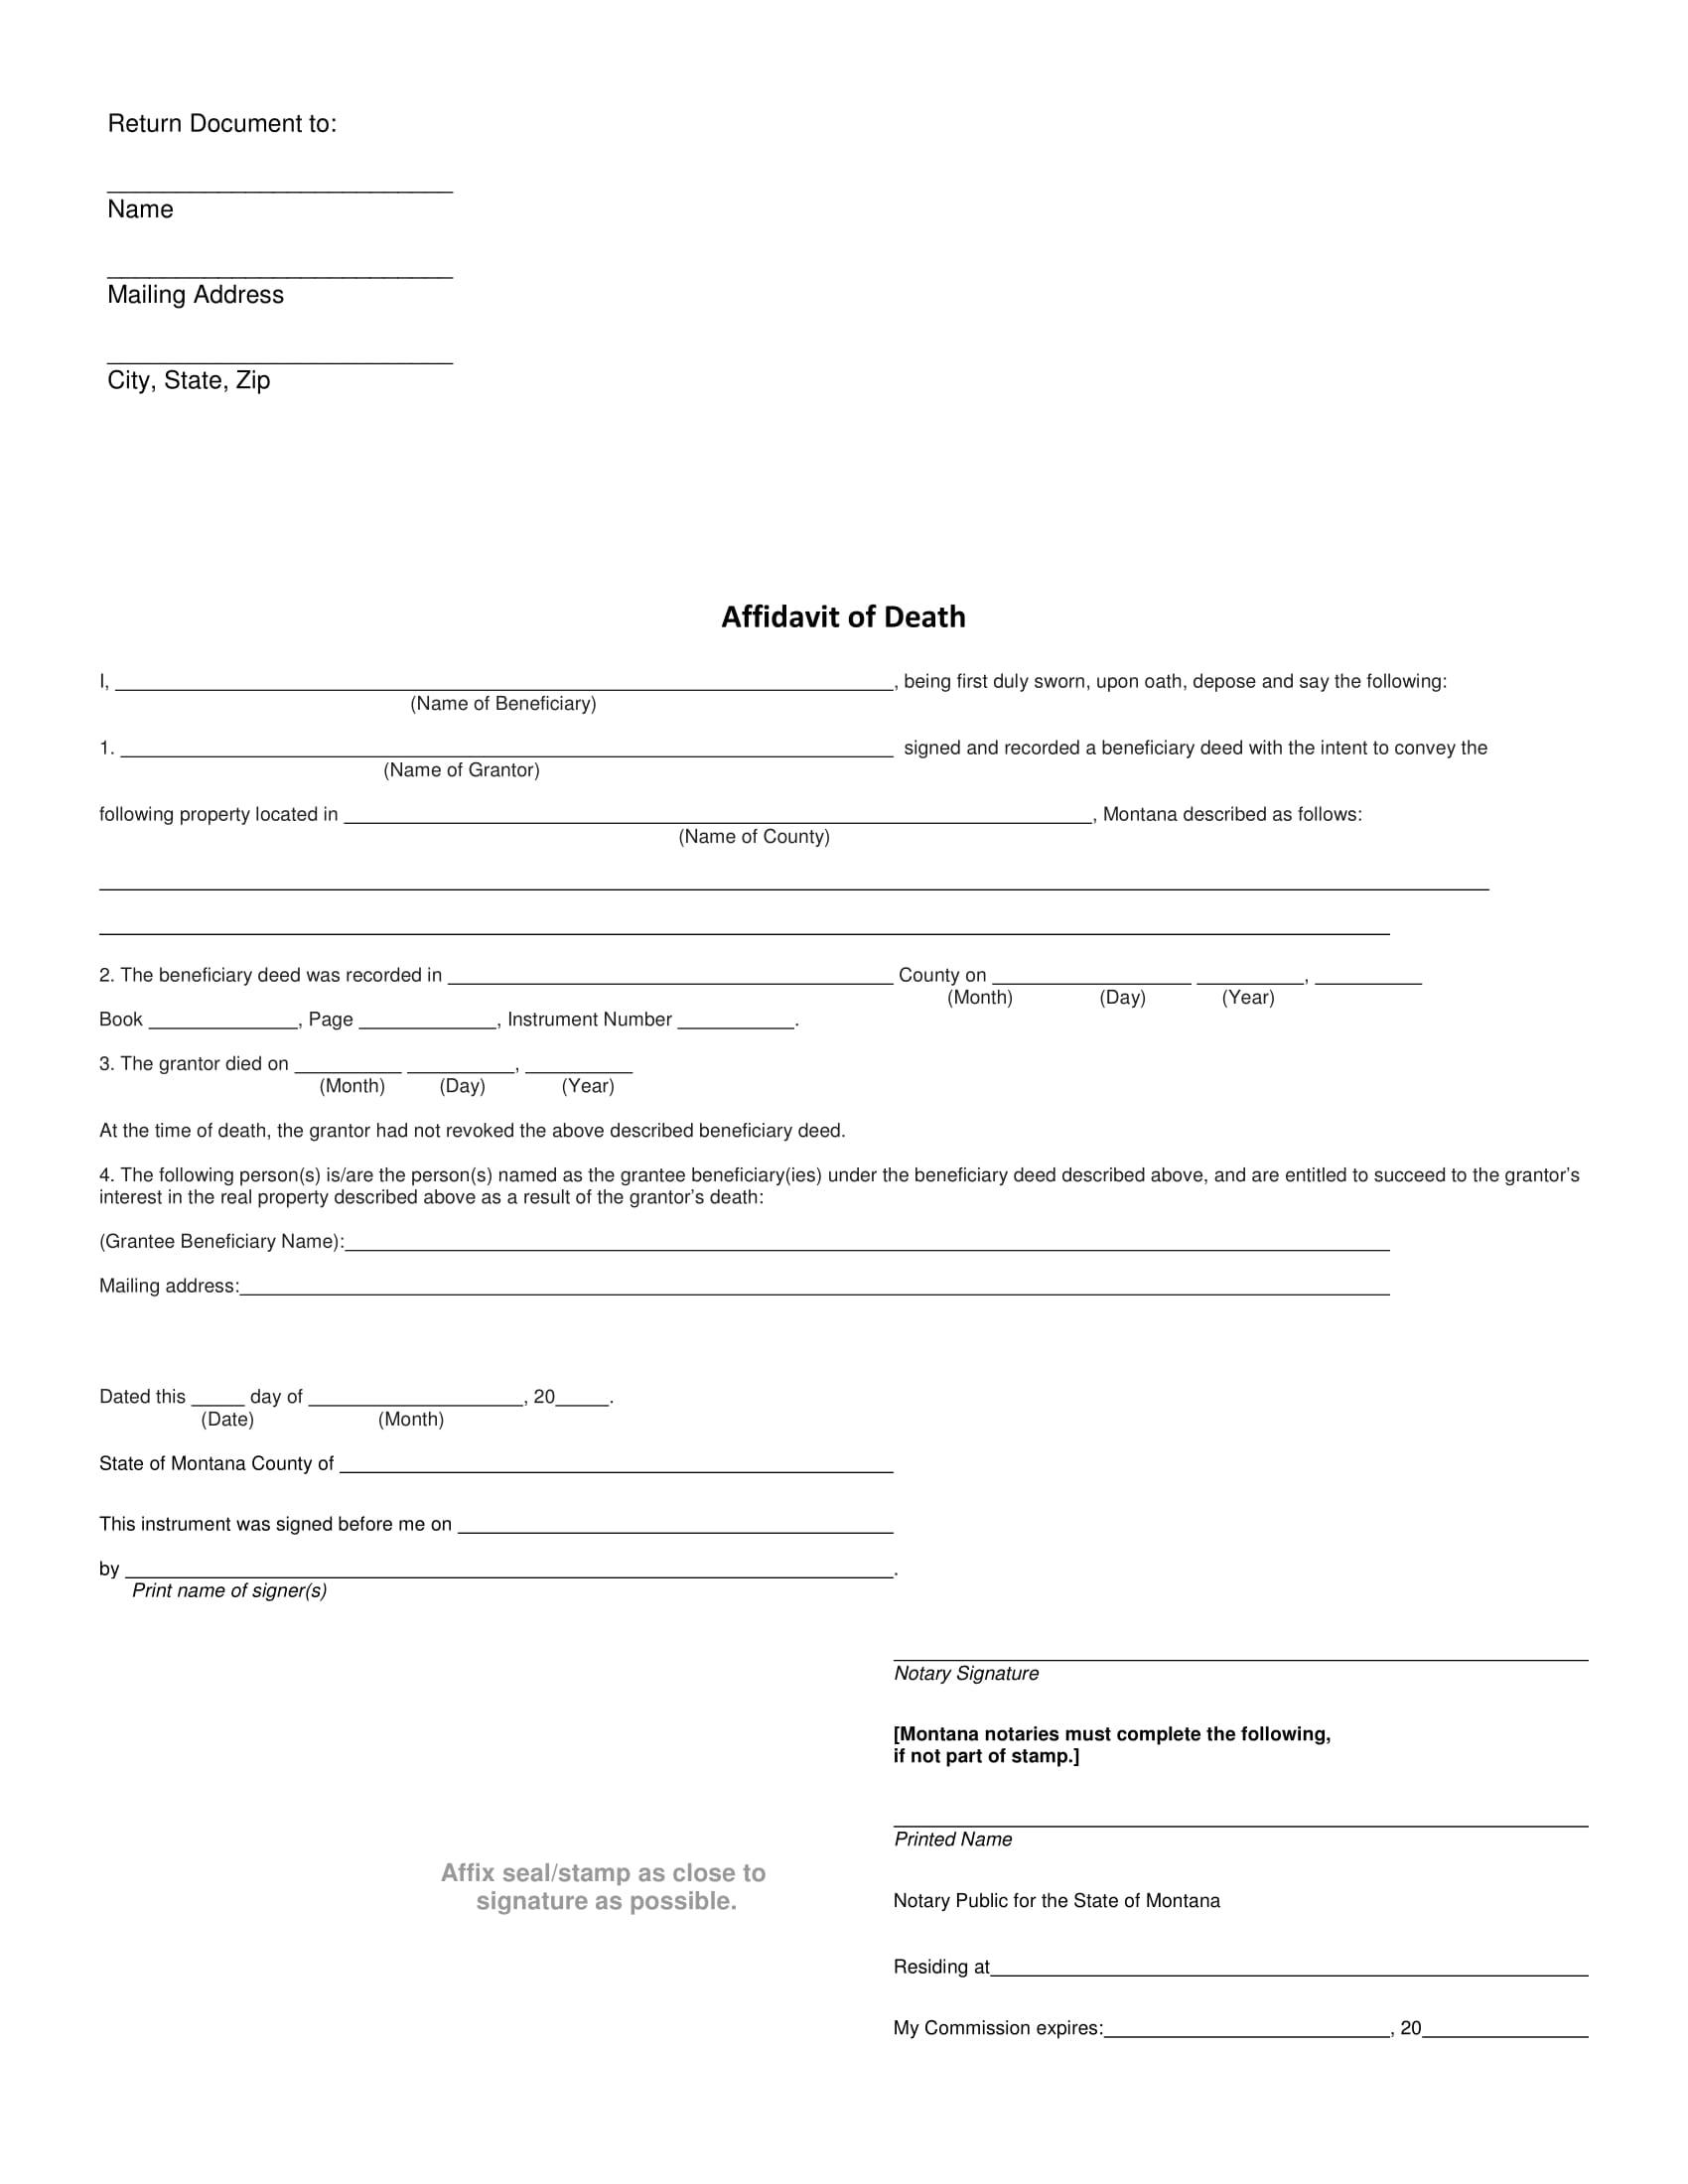 affidavit of death form 1